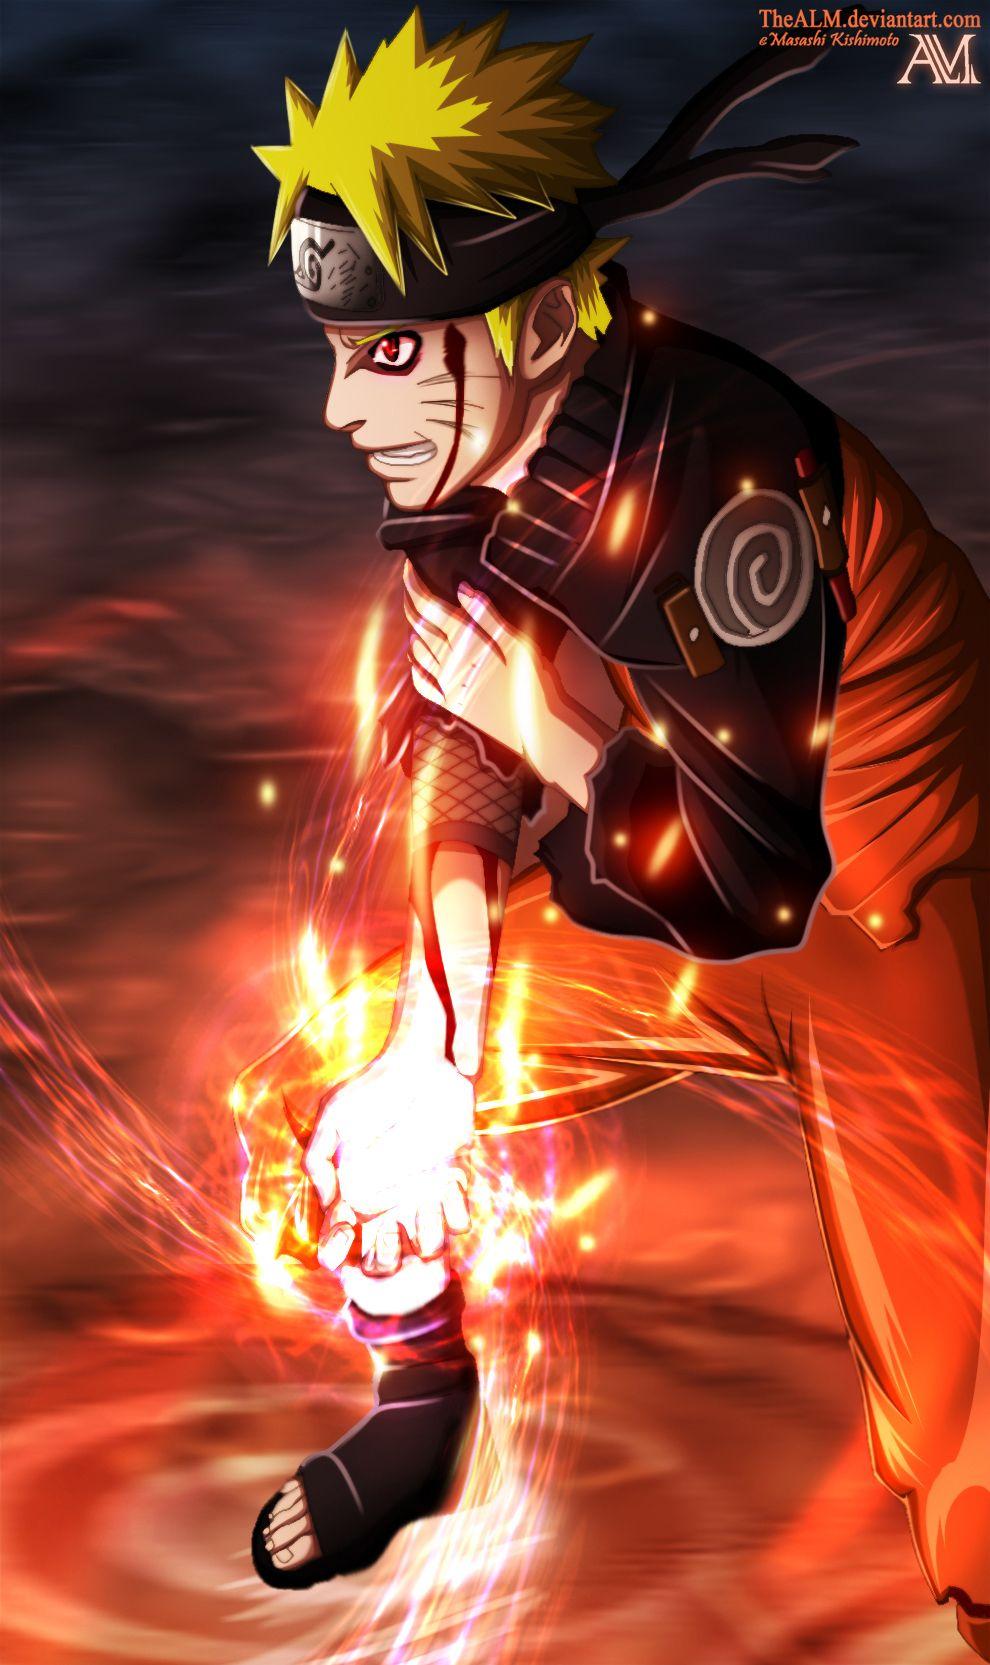 Naruto Kyubi Rasengan By Thealm On Deviantart Naruto Shippuden Anime Naruto Naruto Shippuden Sasuke